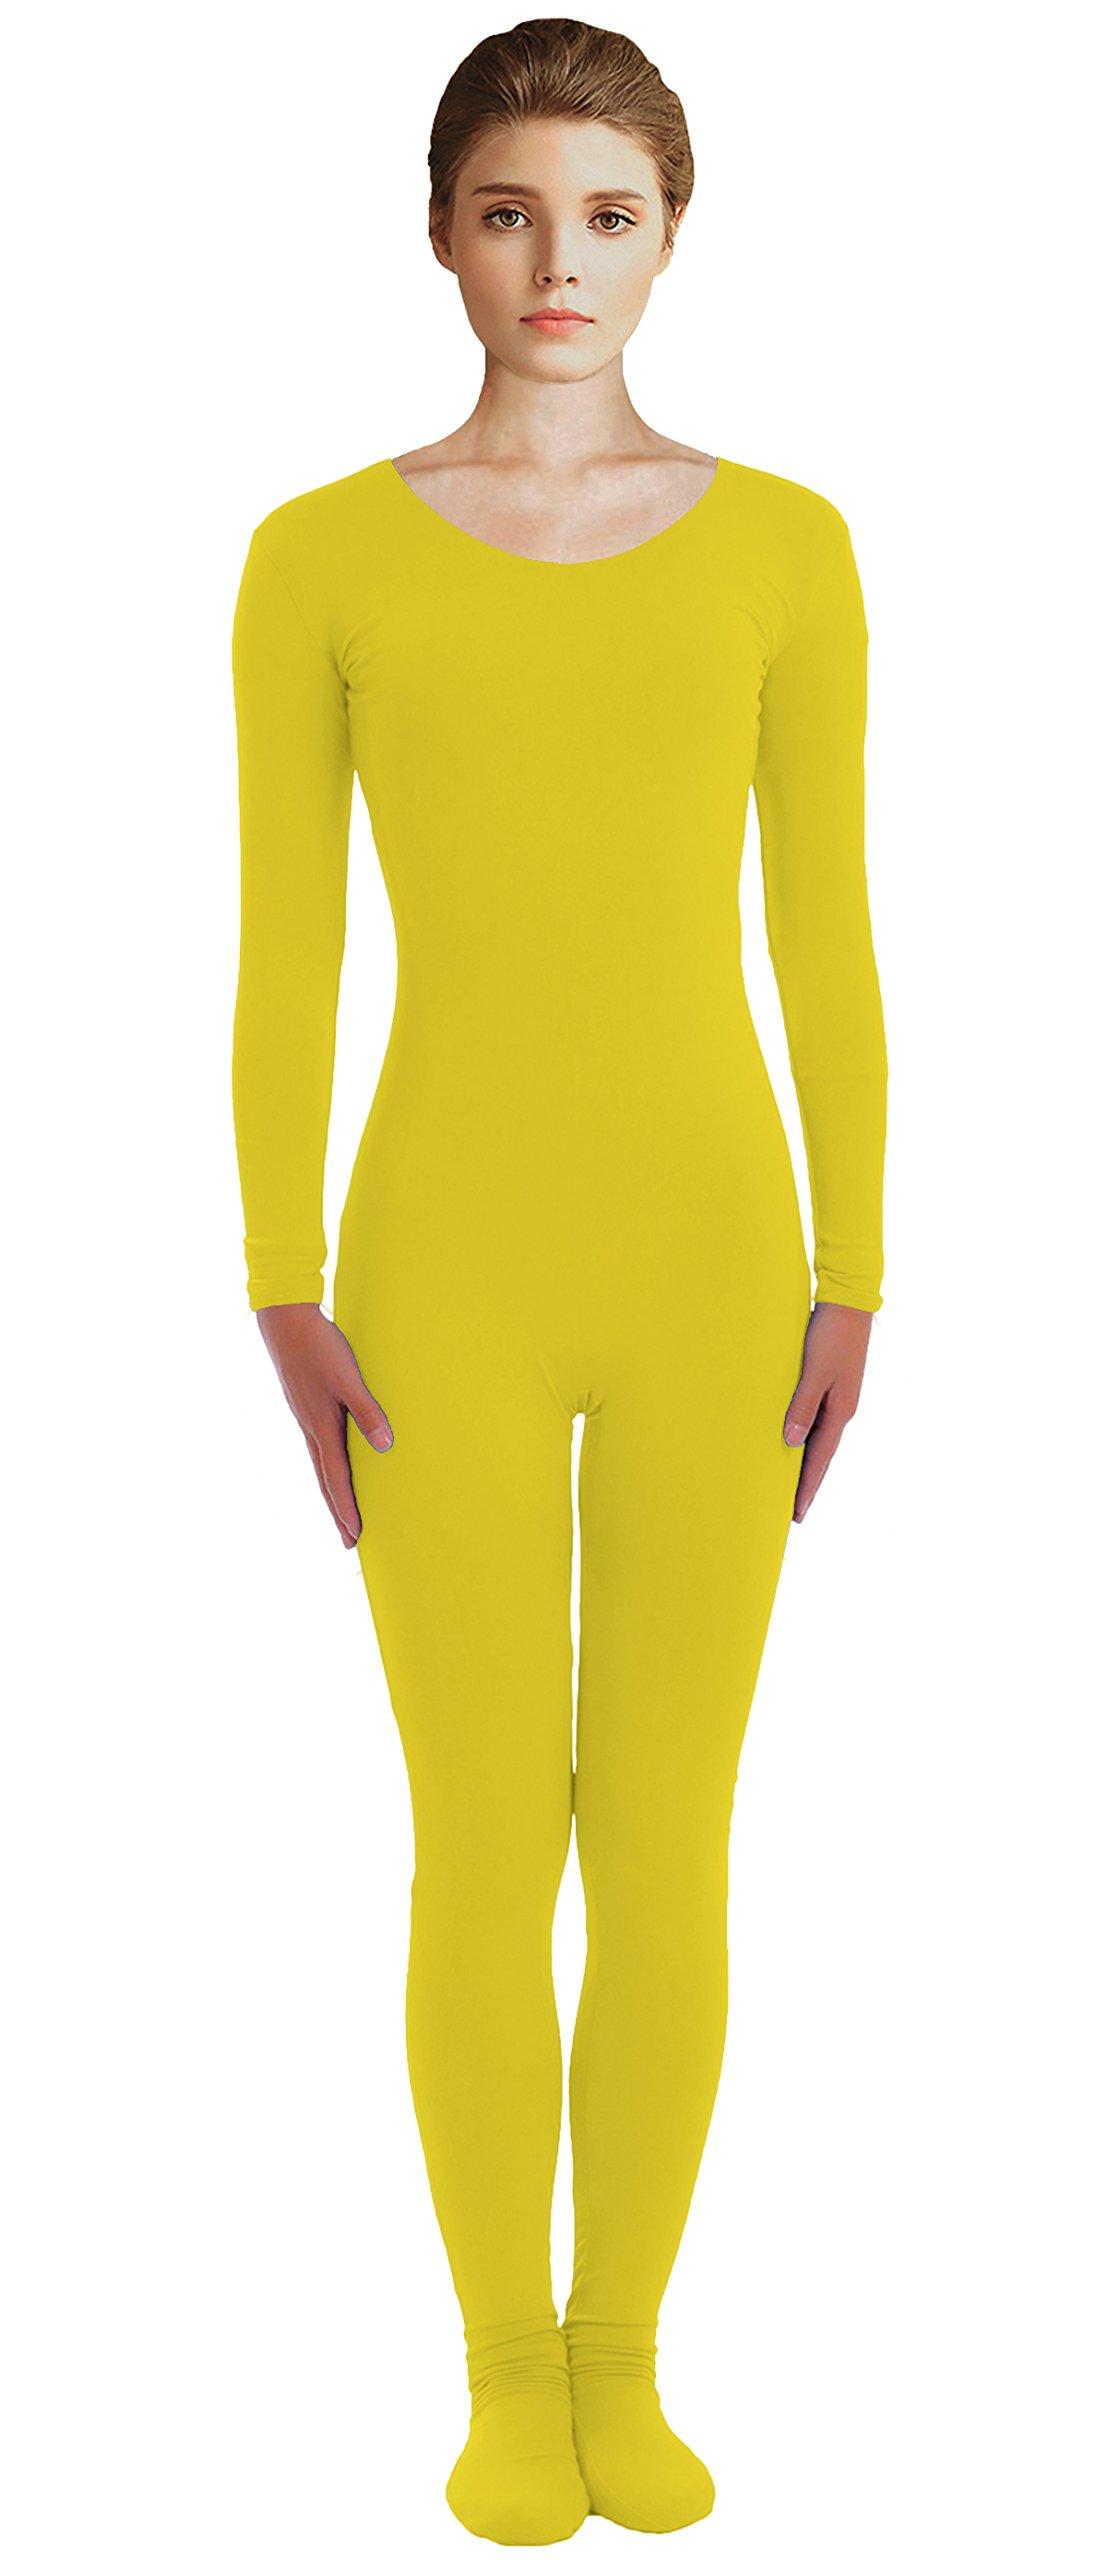 VSVO Adult Yellow Scoop Neckline Unitard with Socks Catsuit Dancewear (XX-Large, Yellow) by VSVO